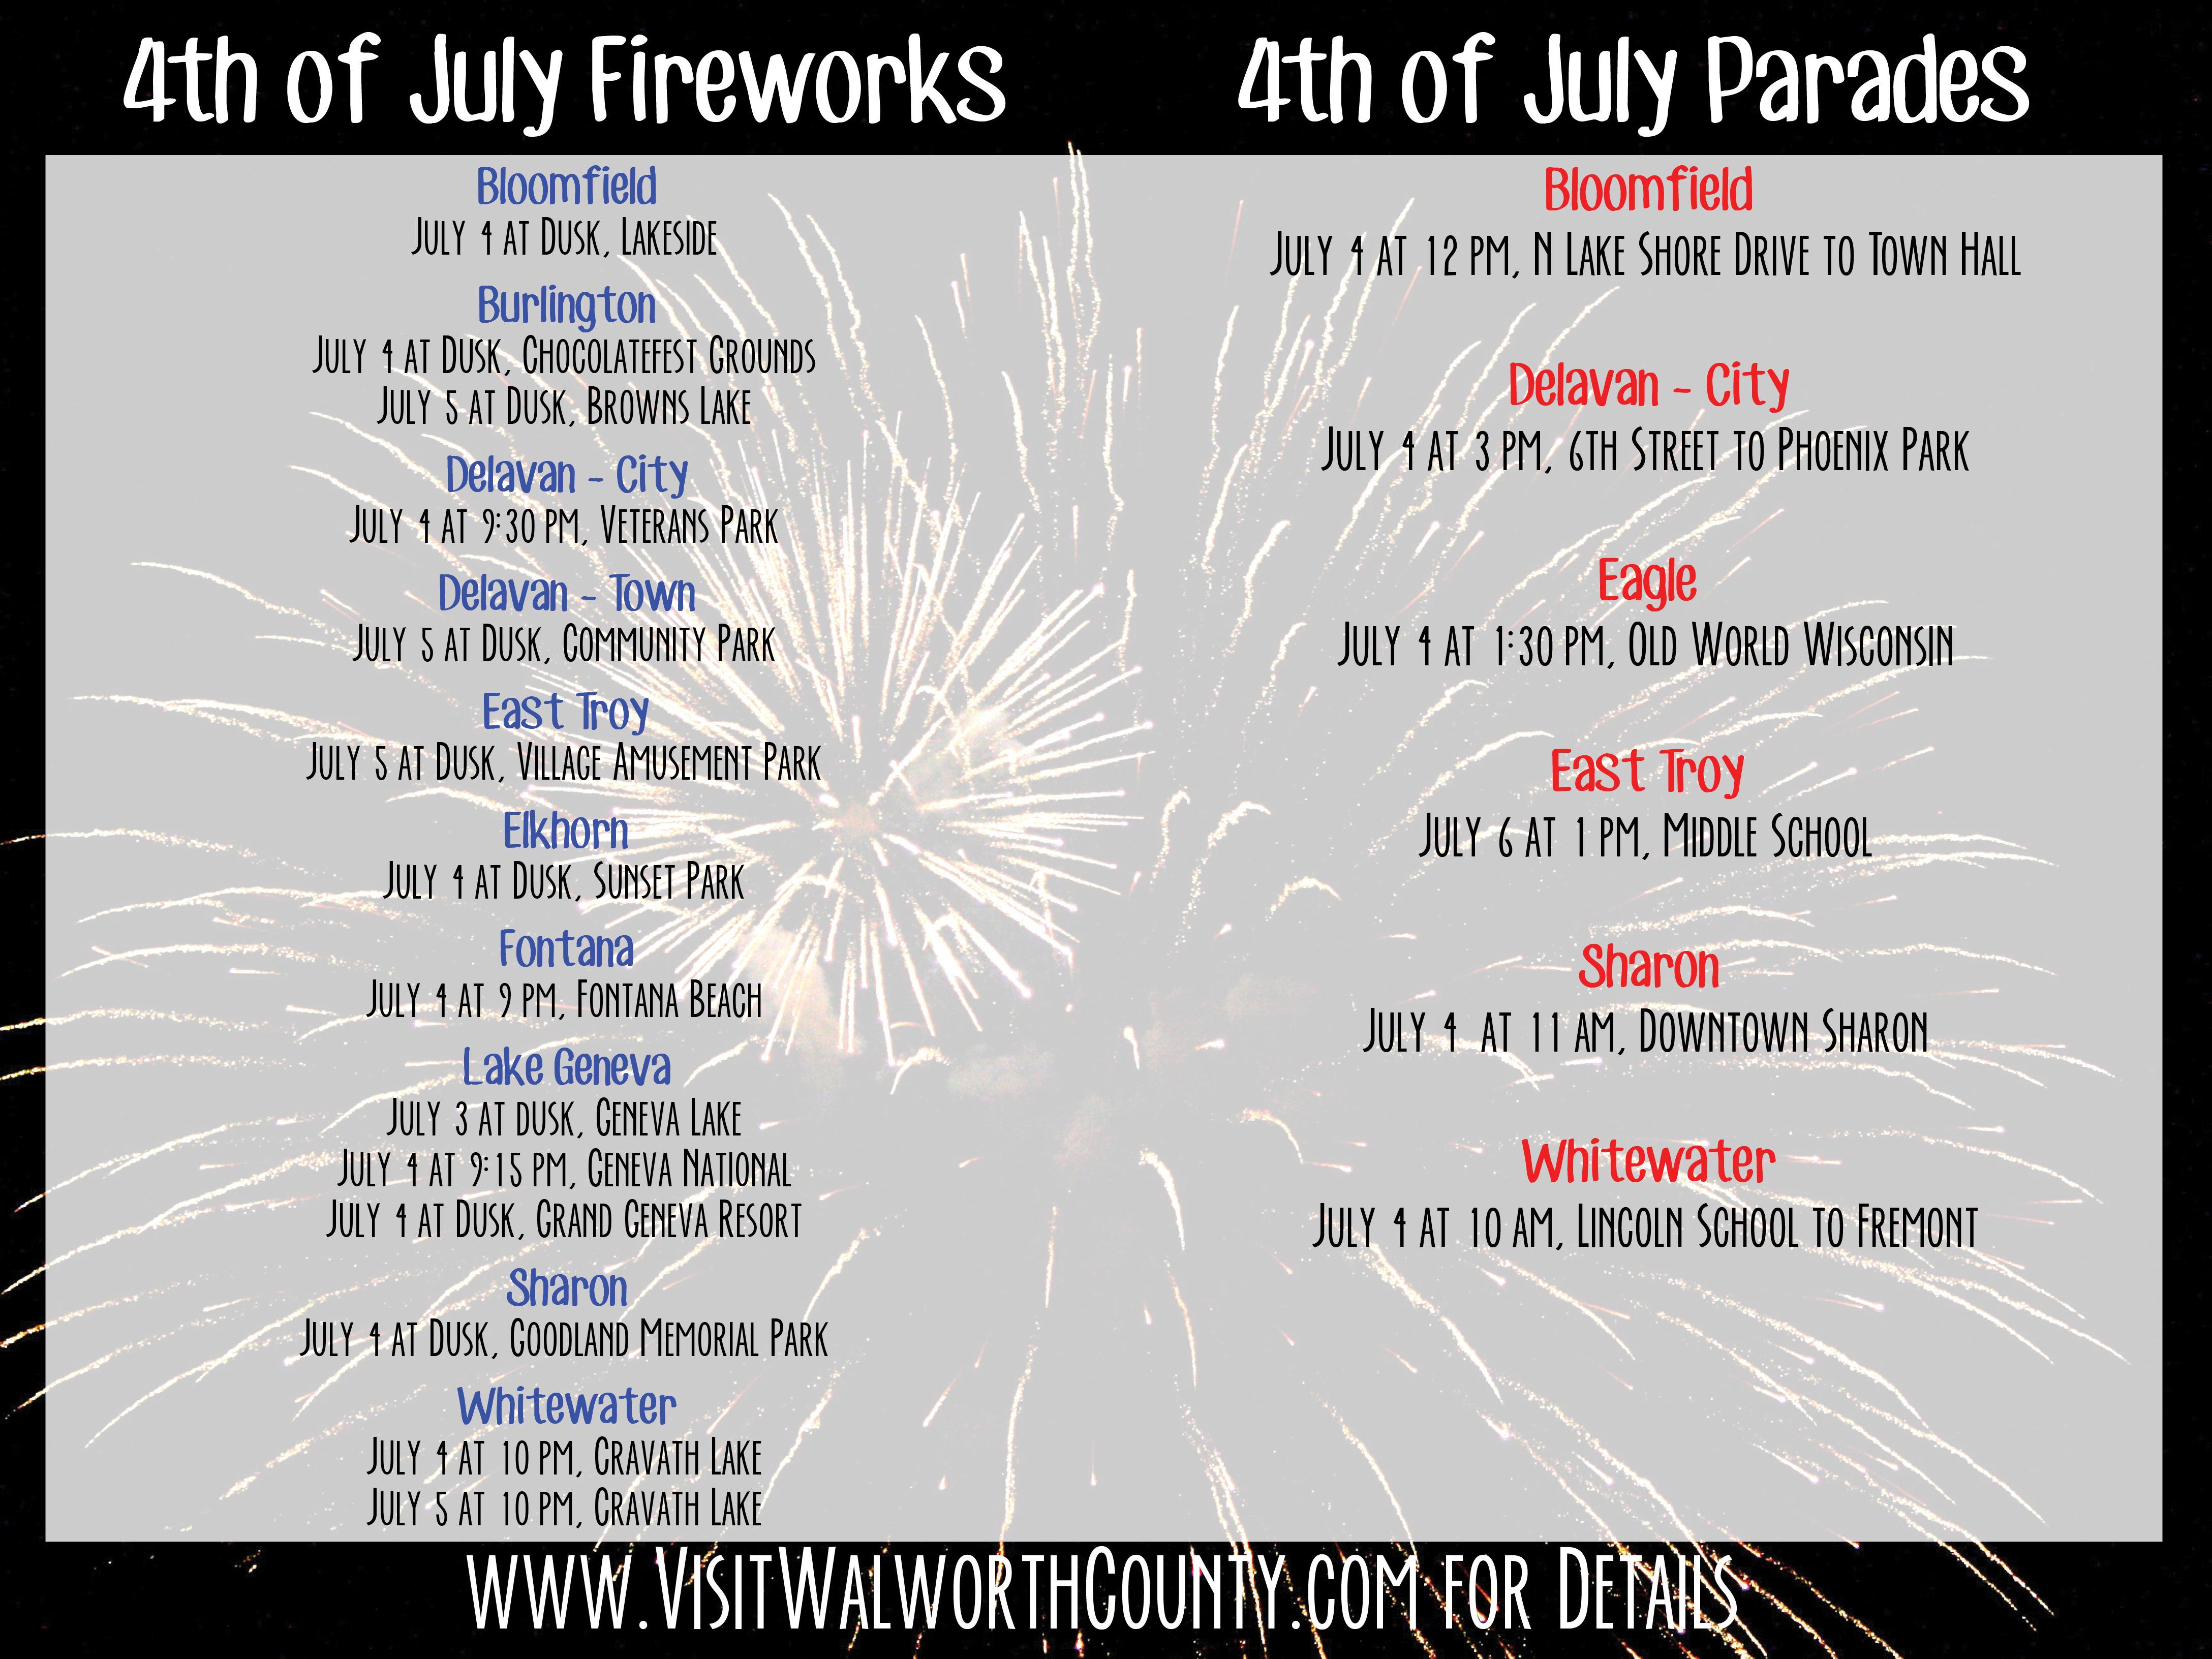 2014 July 4 Fireworks Parades  sc 1 st  Walworth County Visitors Bureau - WordPress.com & 4th of July in the Lake Geneva Area 2014